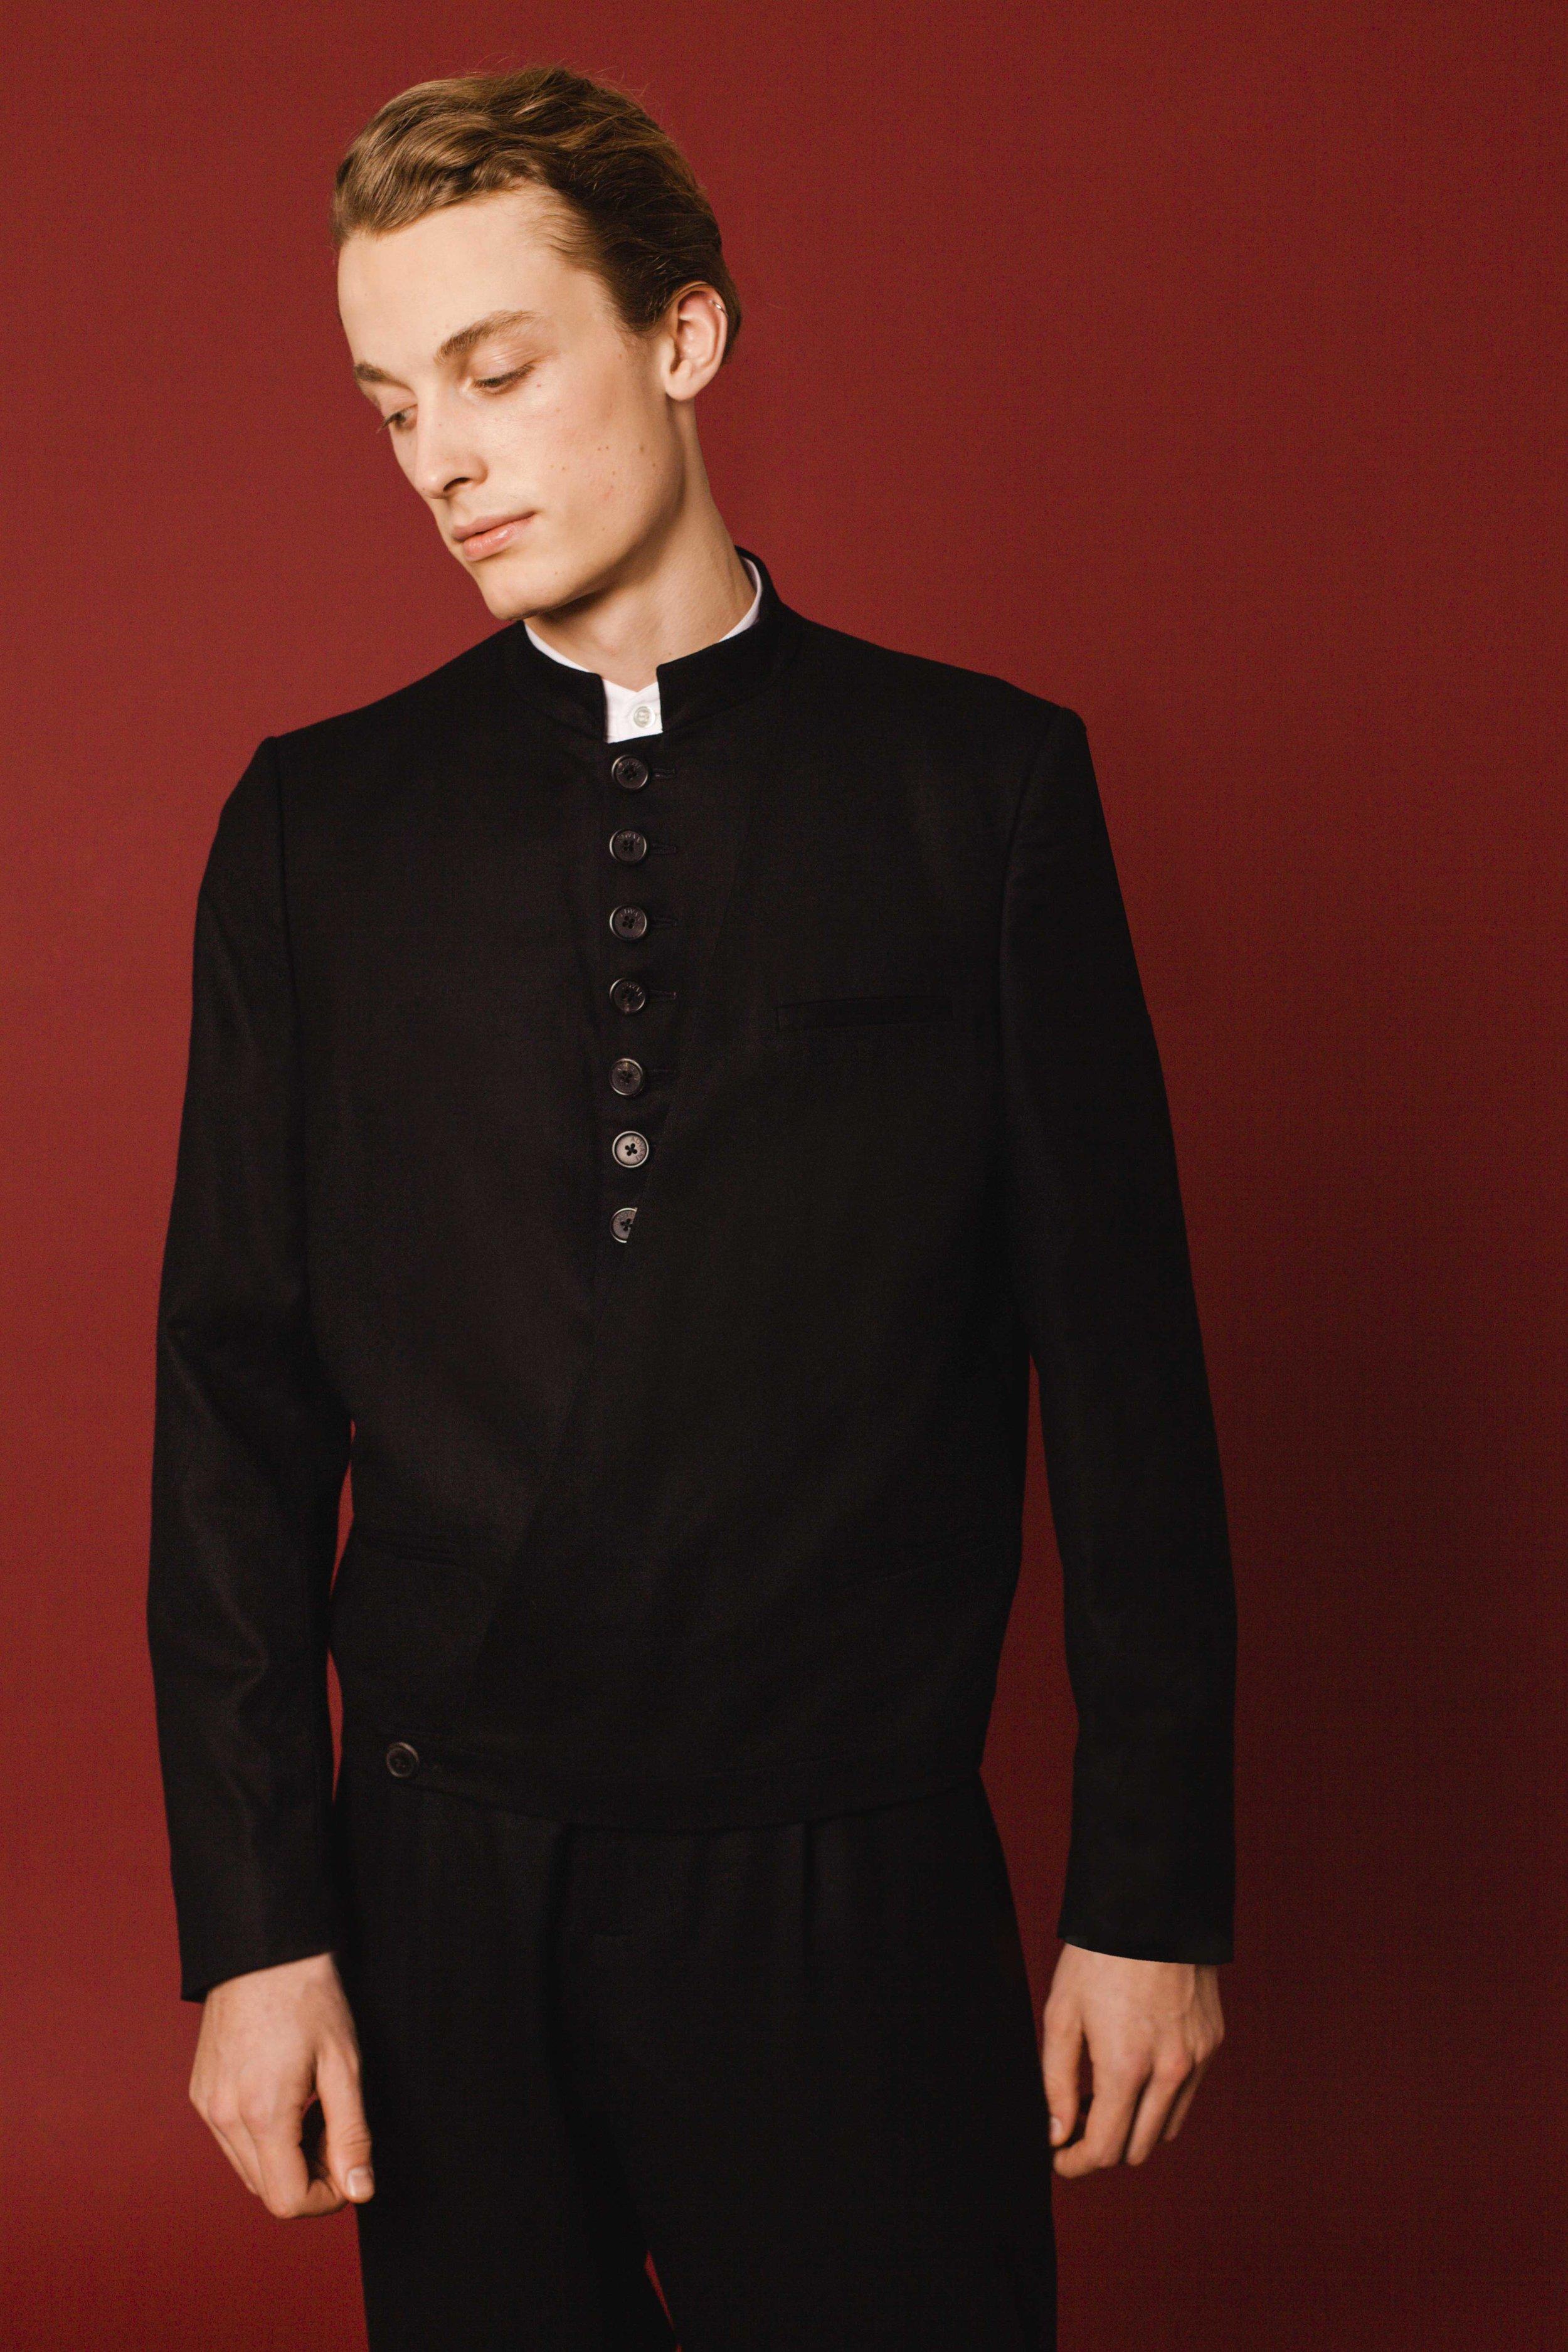 Cross over jacket black wool Drape trousers black wool Made in England